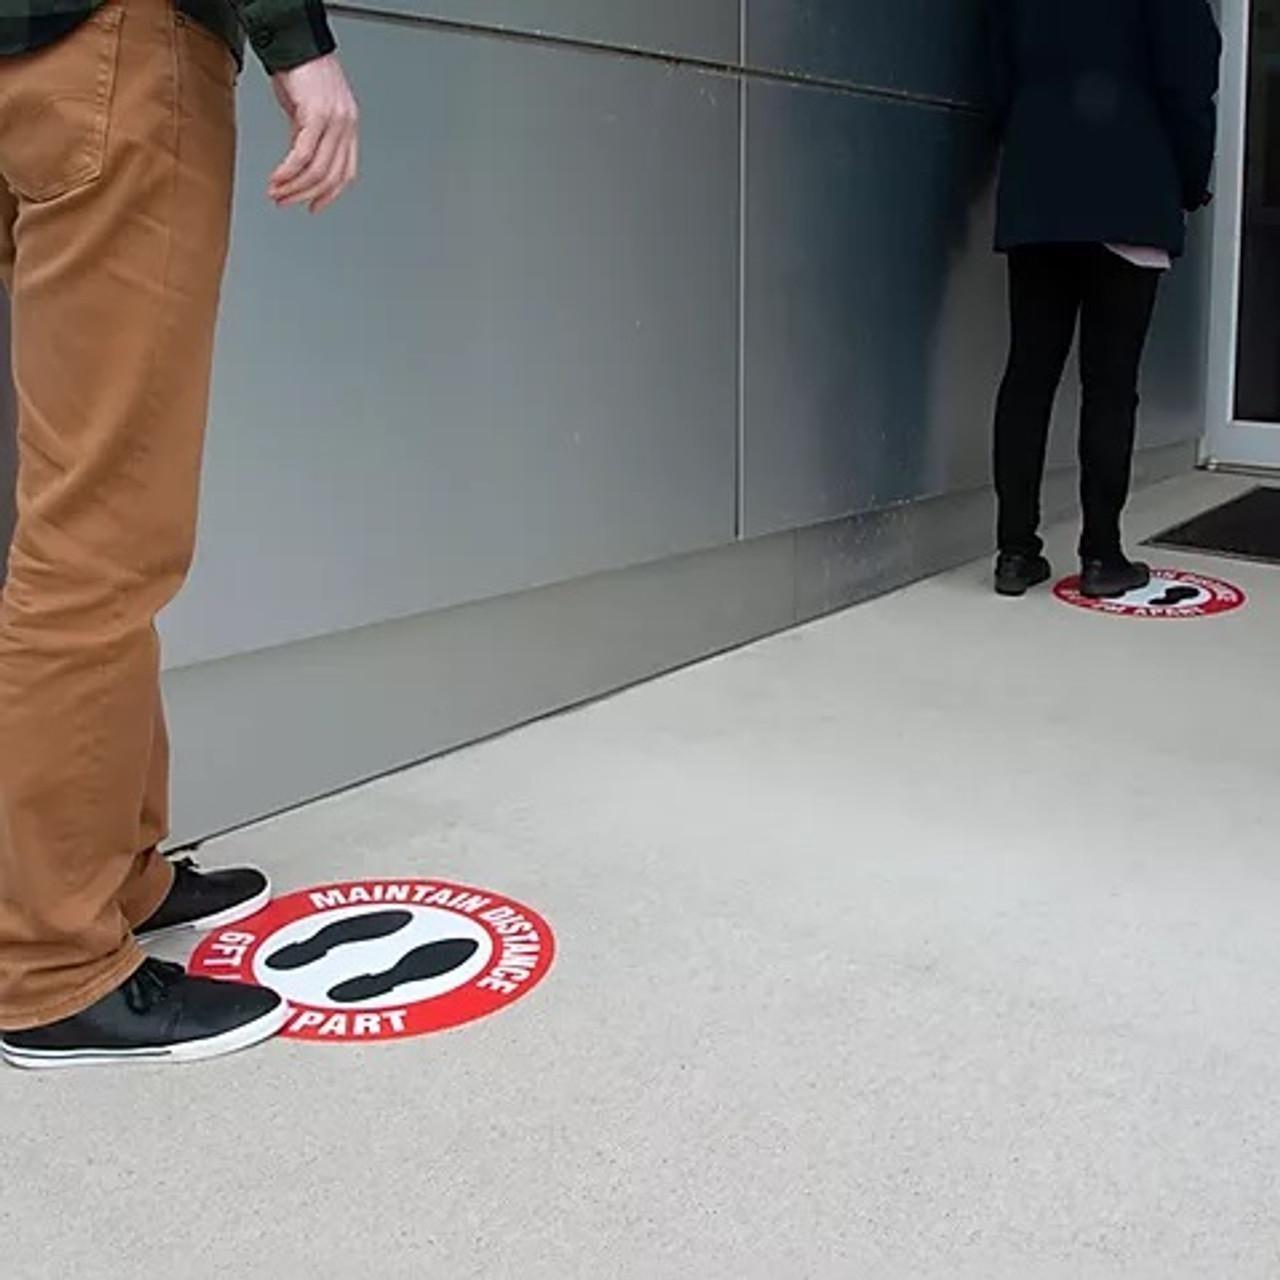 "FS3038OD Outdoor Floor Sign | Heavy Duty | Stop Please Wait Here | 3"" x 24"" | Pack of 5"